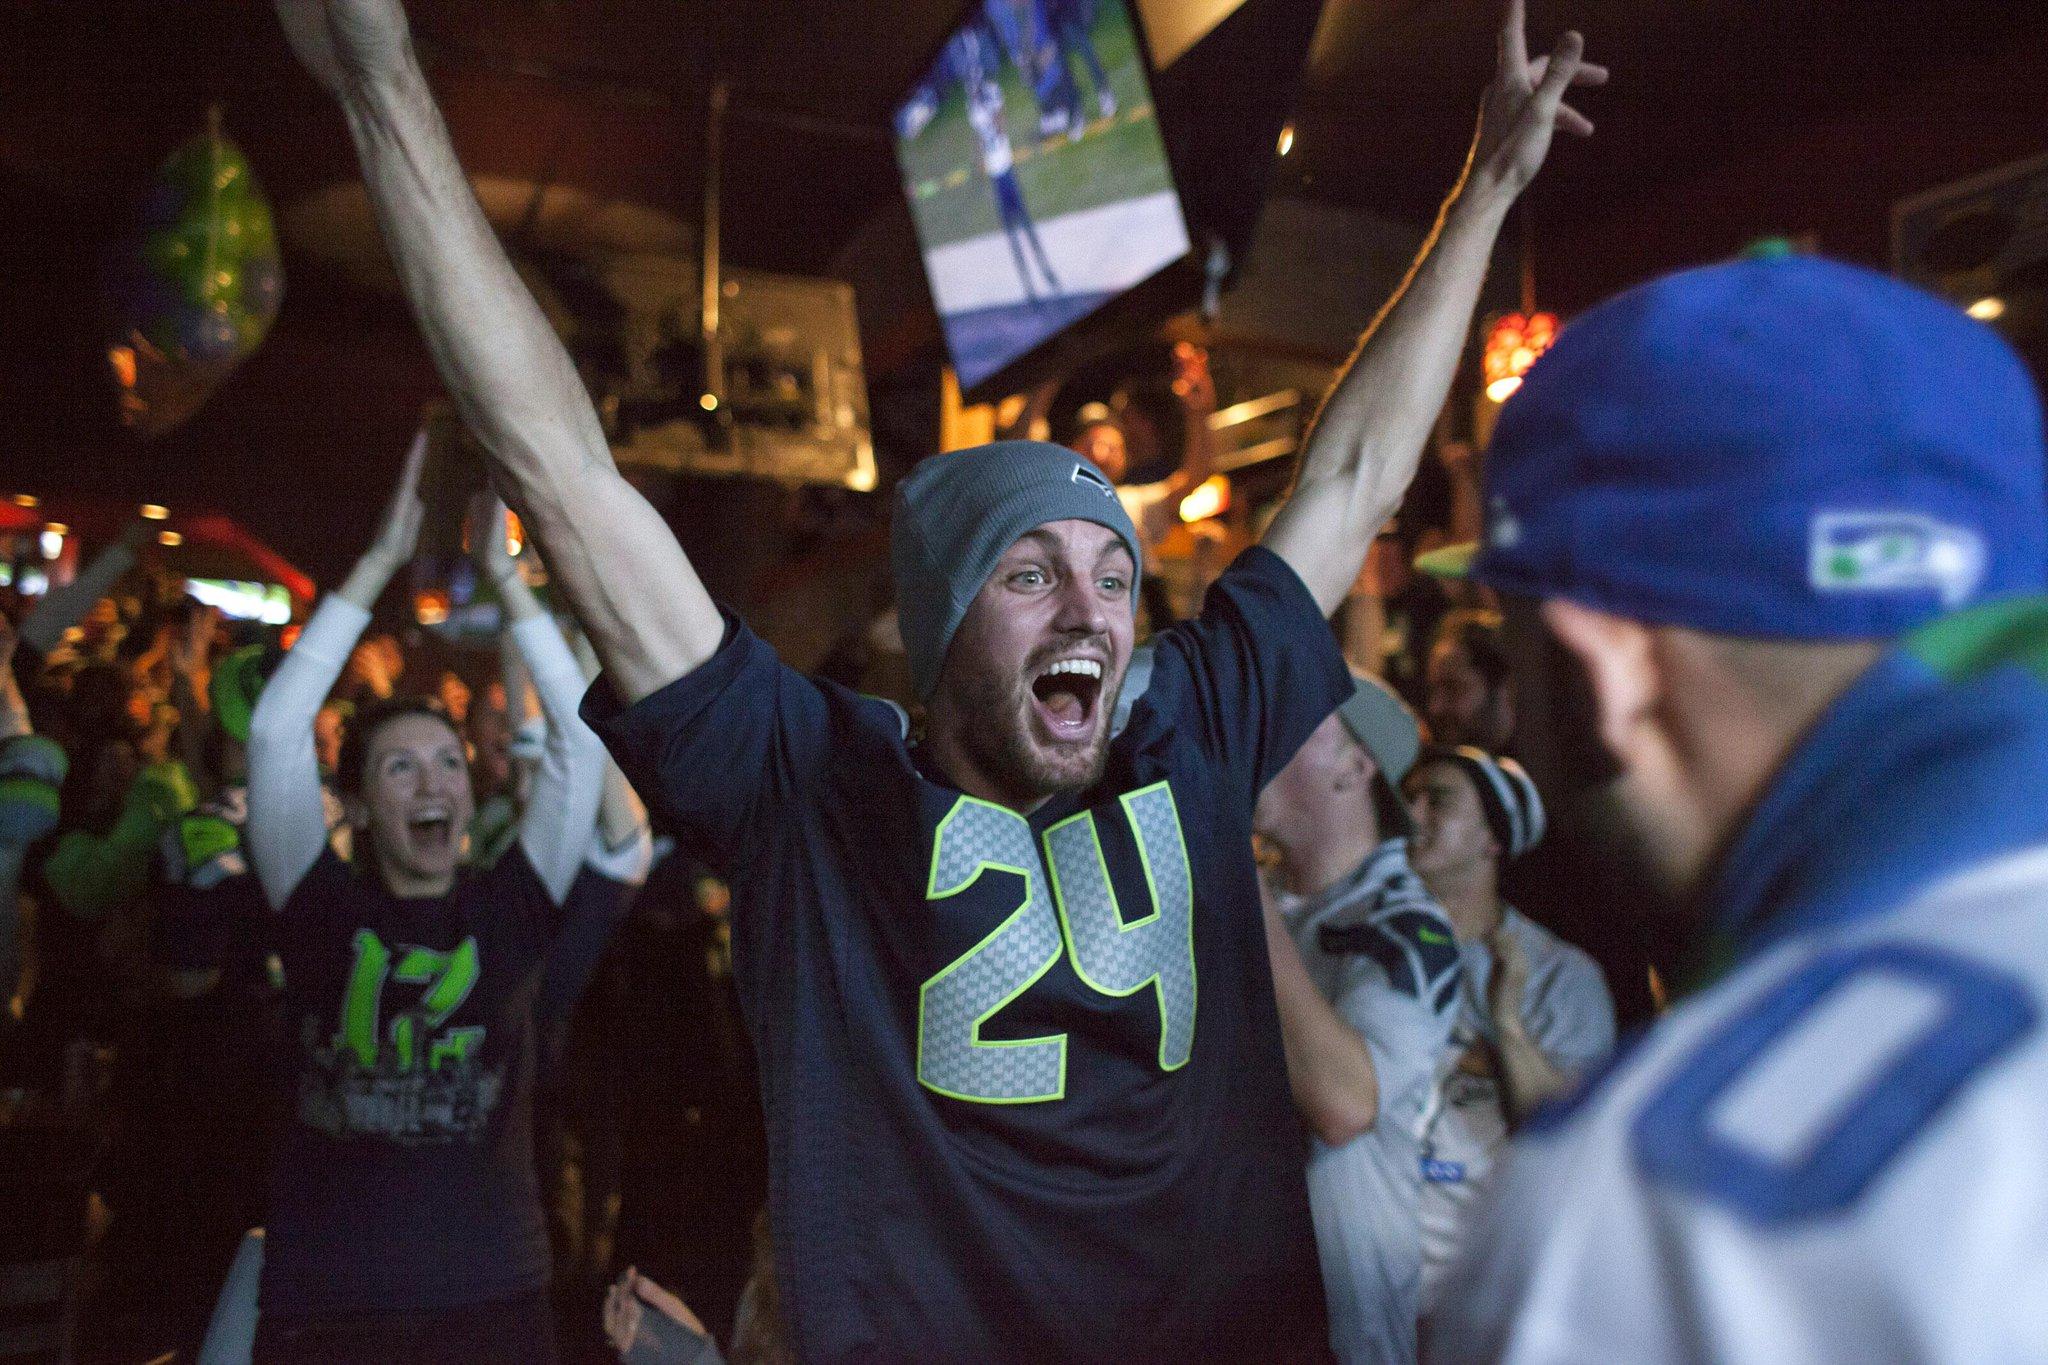 What it feels like in Seattle   (Photo via @usatsportsimage) http://t.co/7KOKsNNQDX